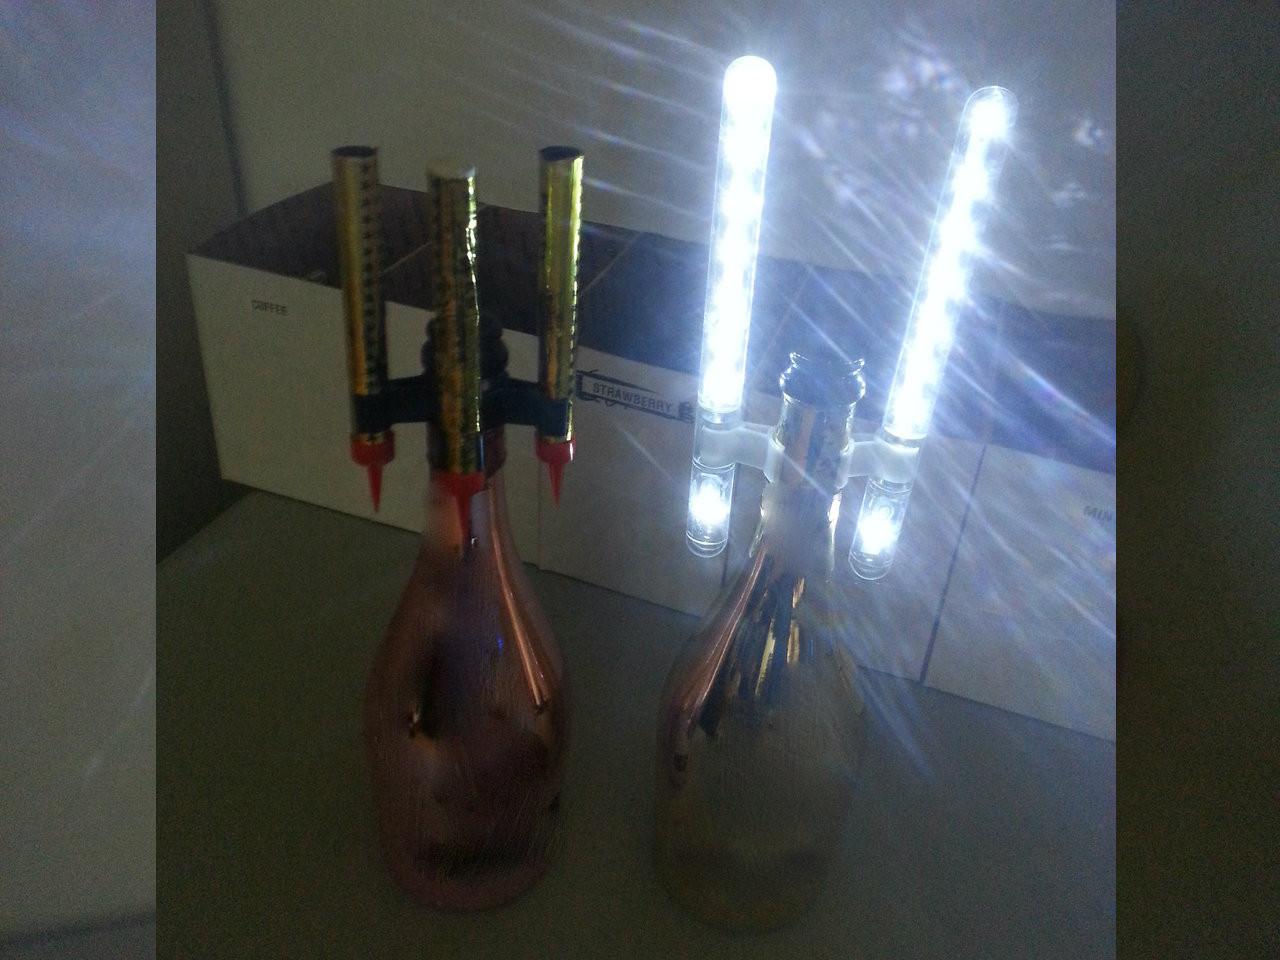 Double Sparklers, Triple, Sparkler, single, sparkler, clip, led NiteSparx Electronic Sparkler clip